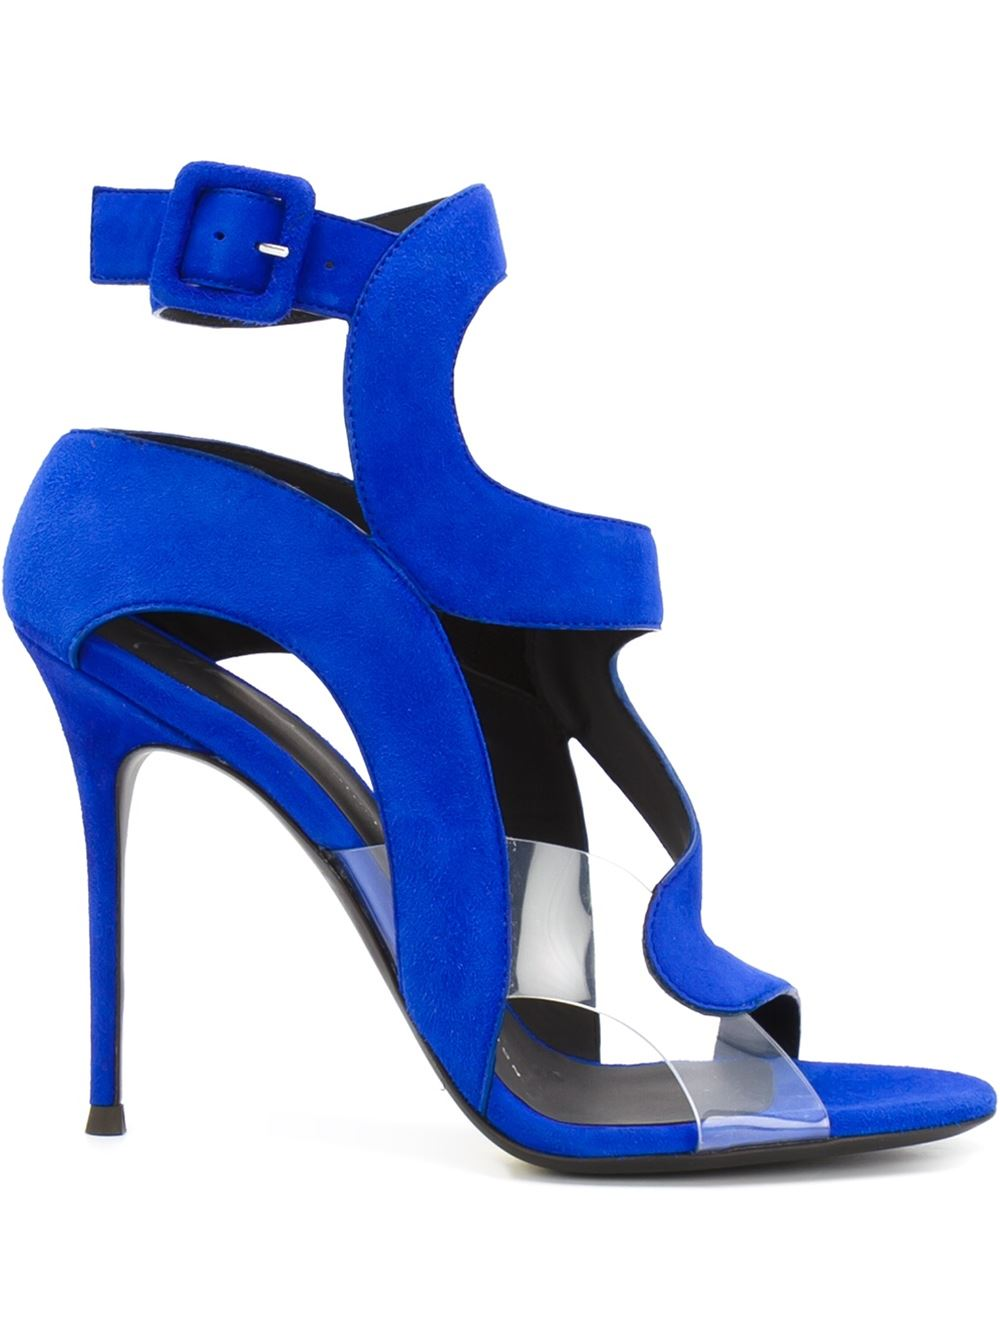 Giuseppe Zanotti Design curved strap sandal, FarFetch.com